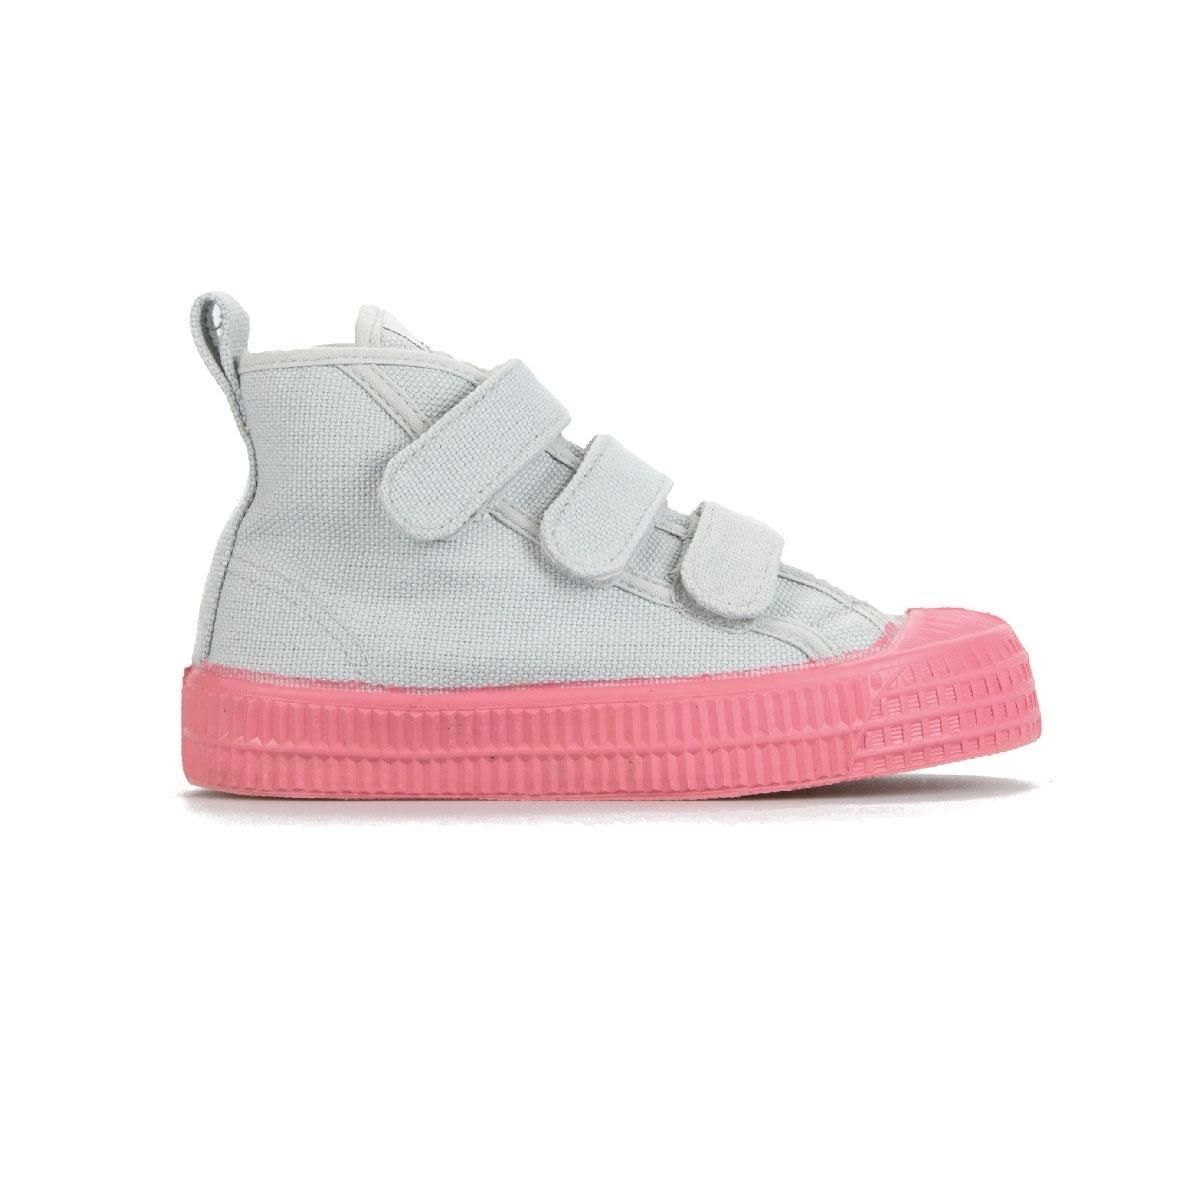 STAR DRIBBLE KID - Grey / Pink-3